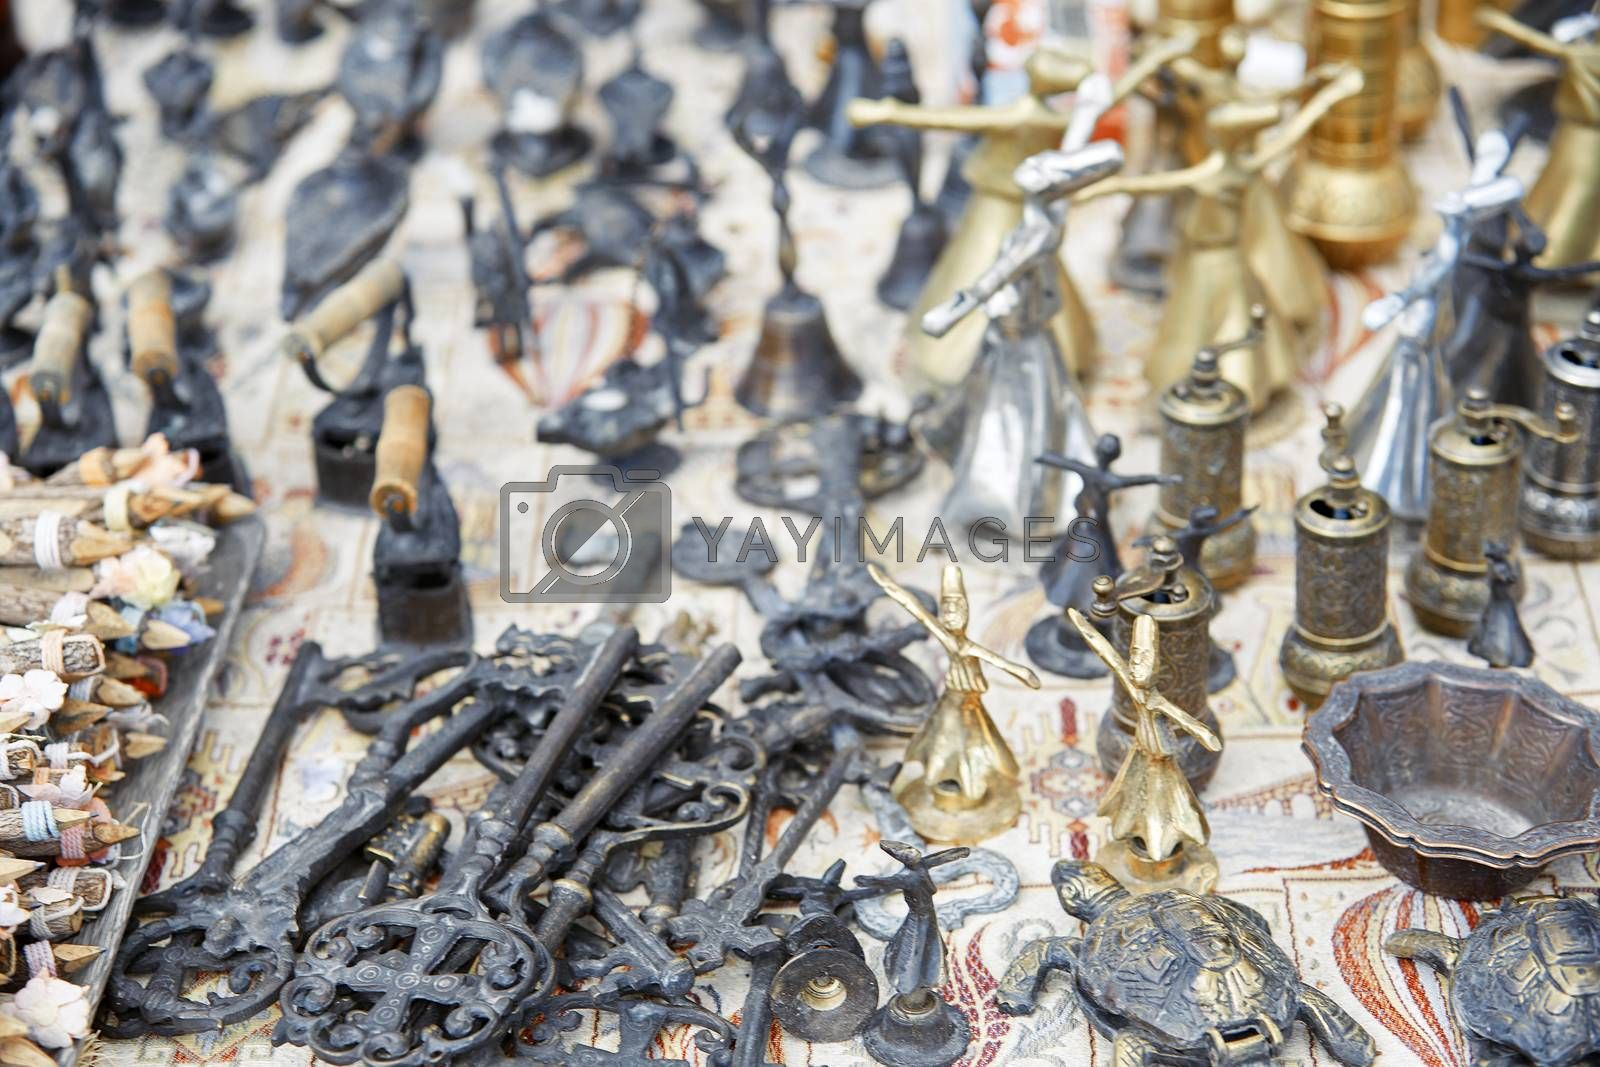 Knickknack items at outdoor flea market in Istanbul, Turkey